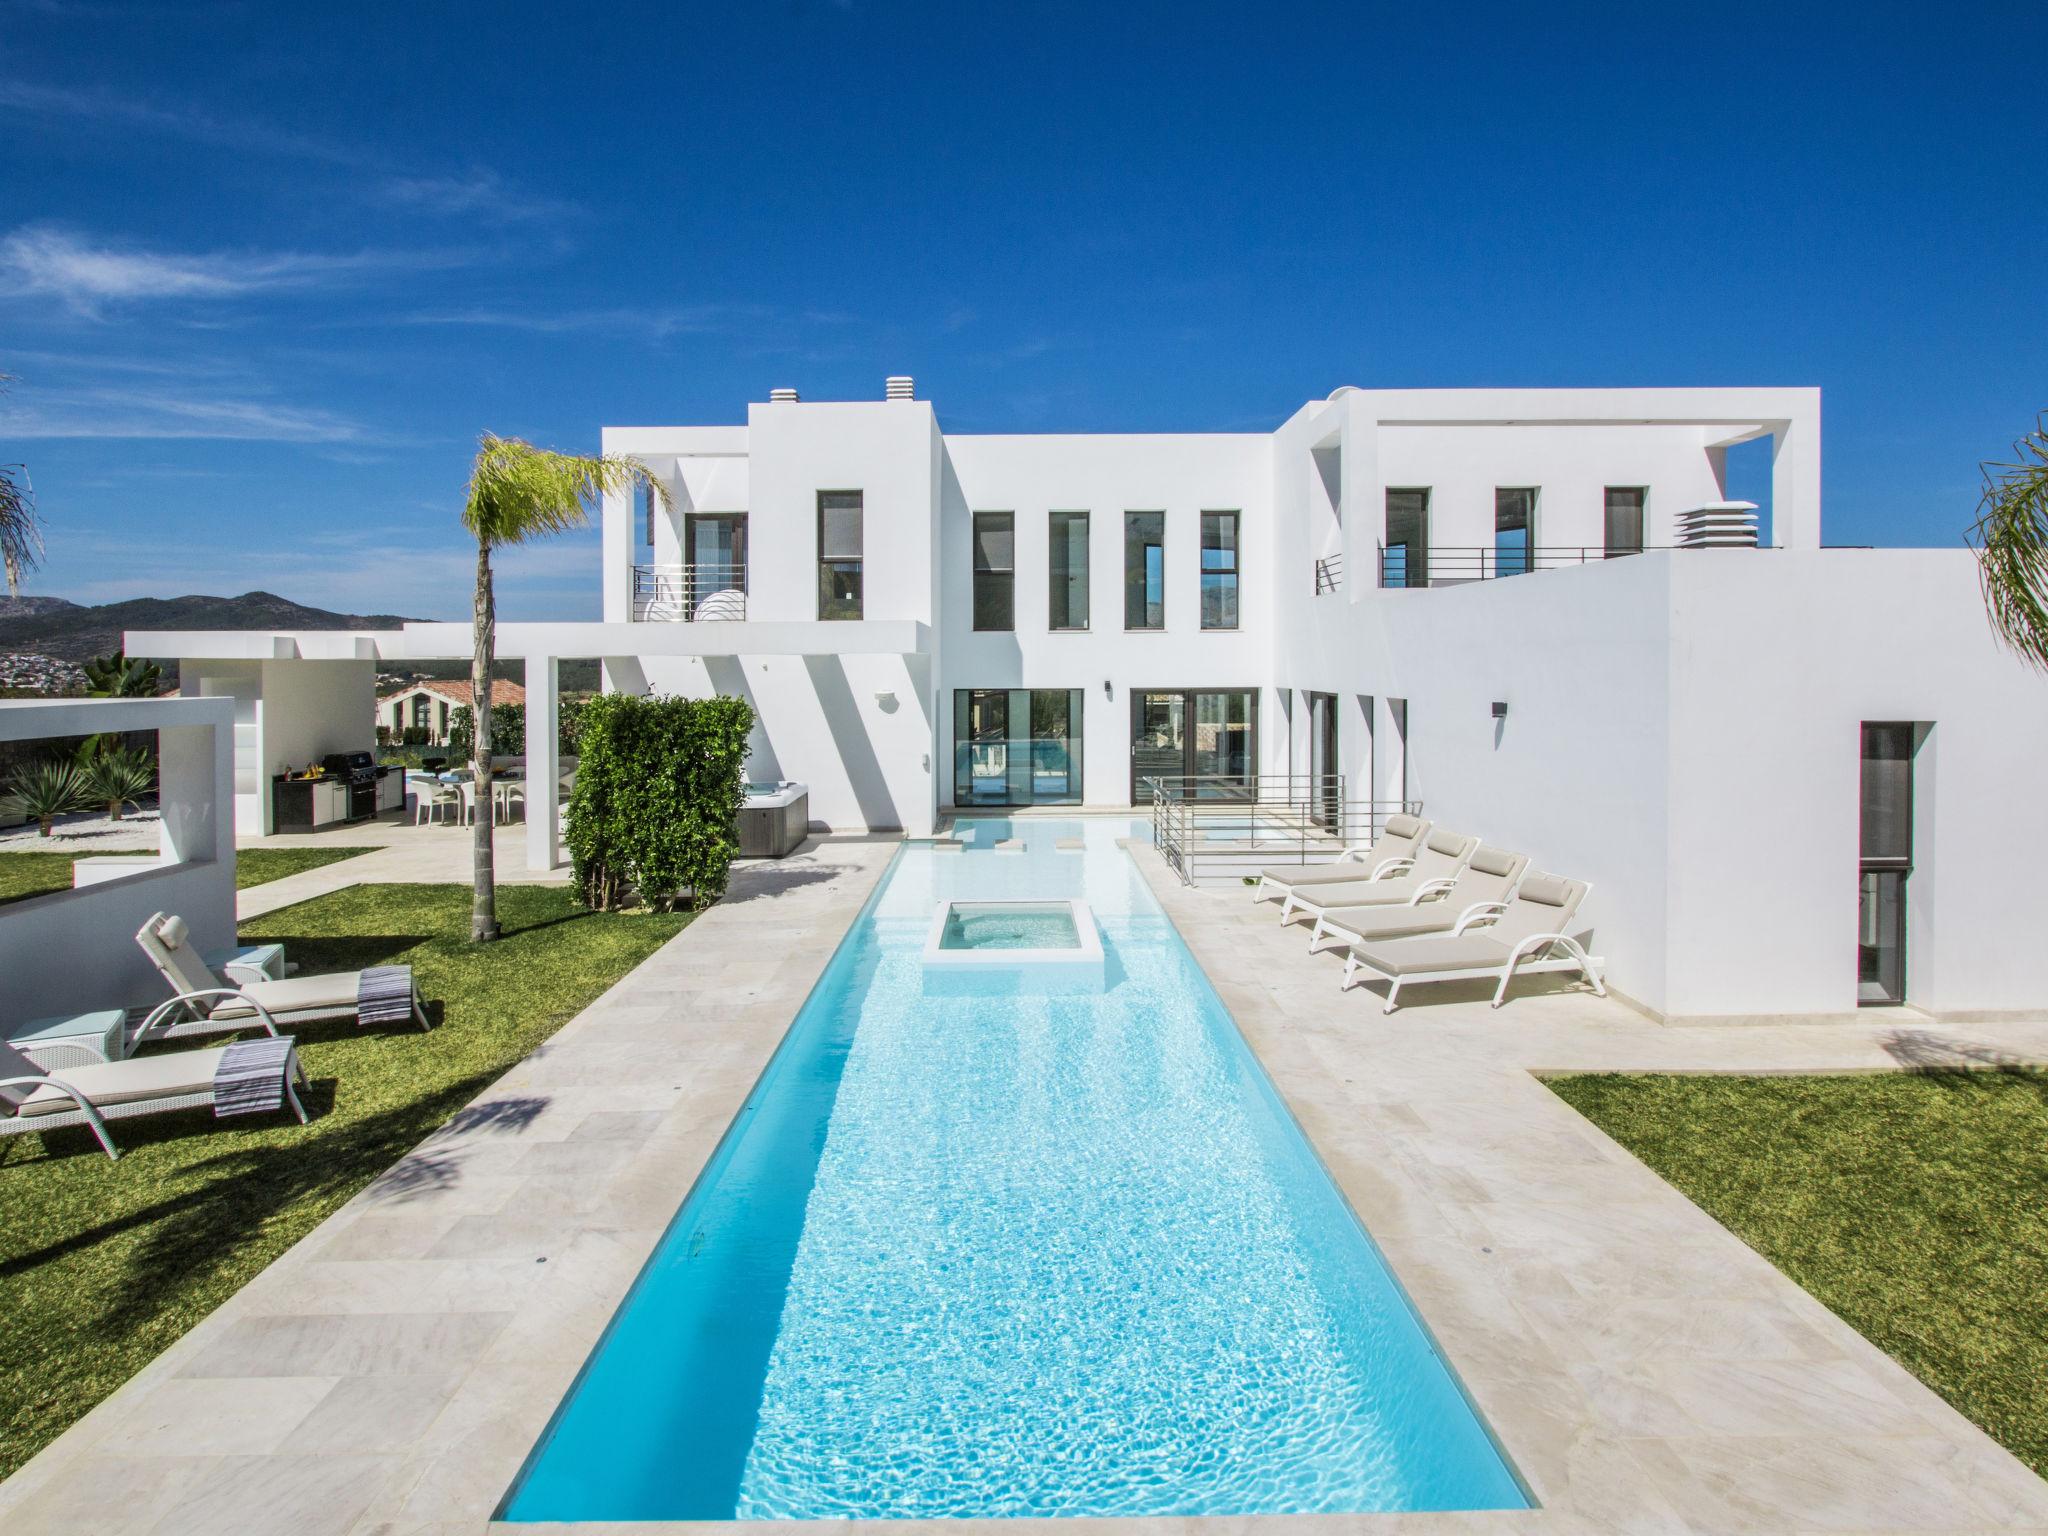 Villa Nouro,Javea,Costa Blanca #2